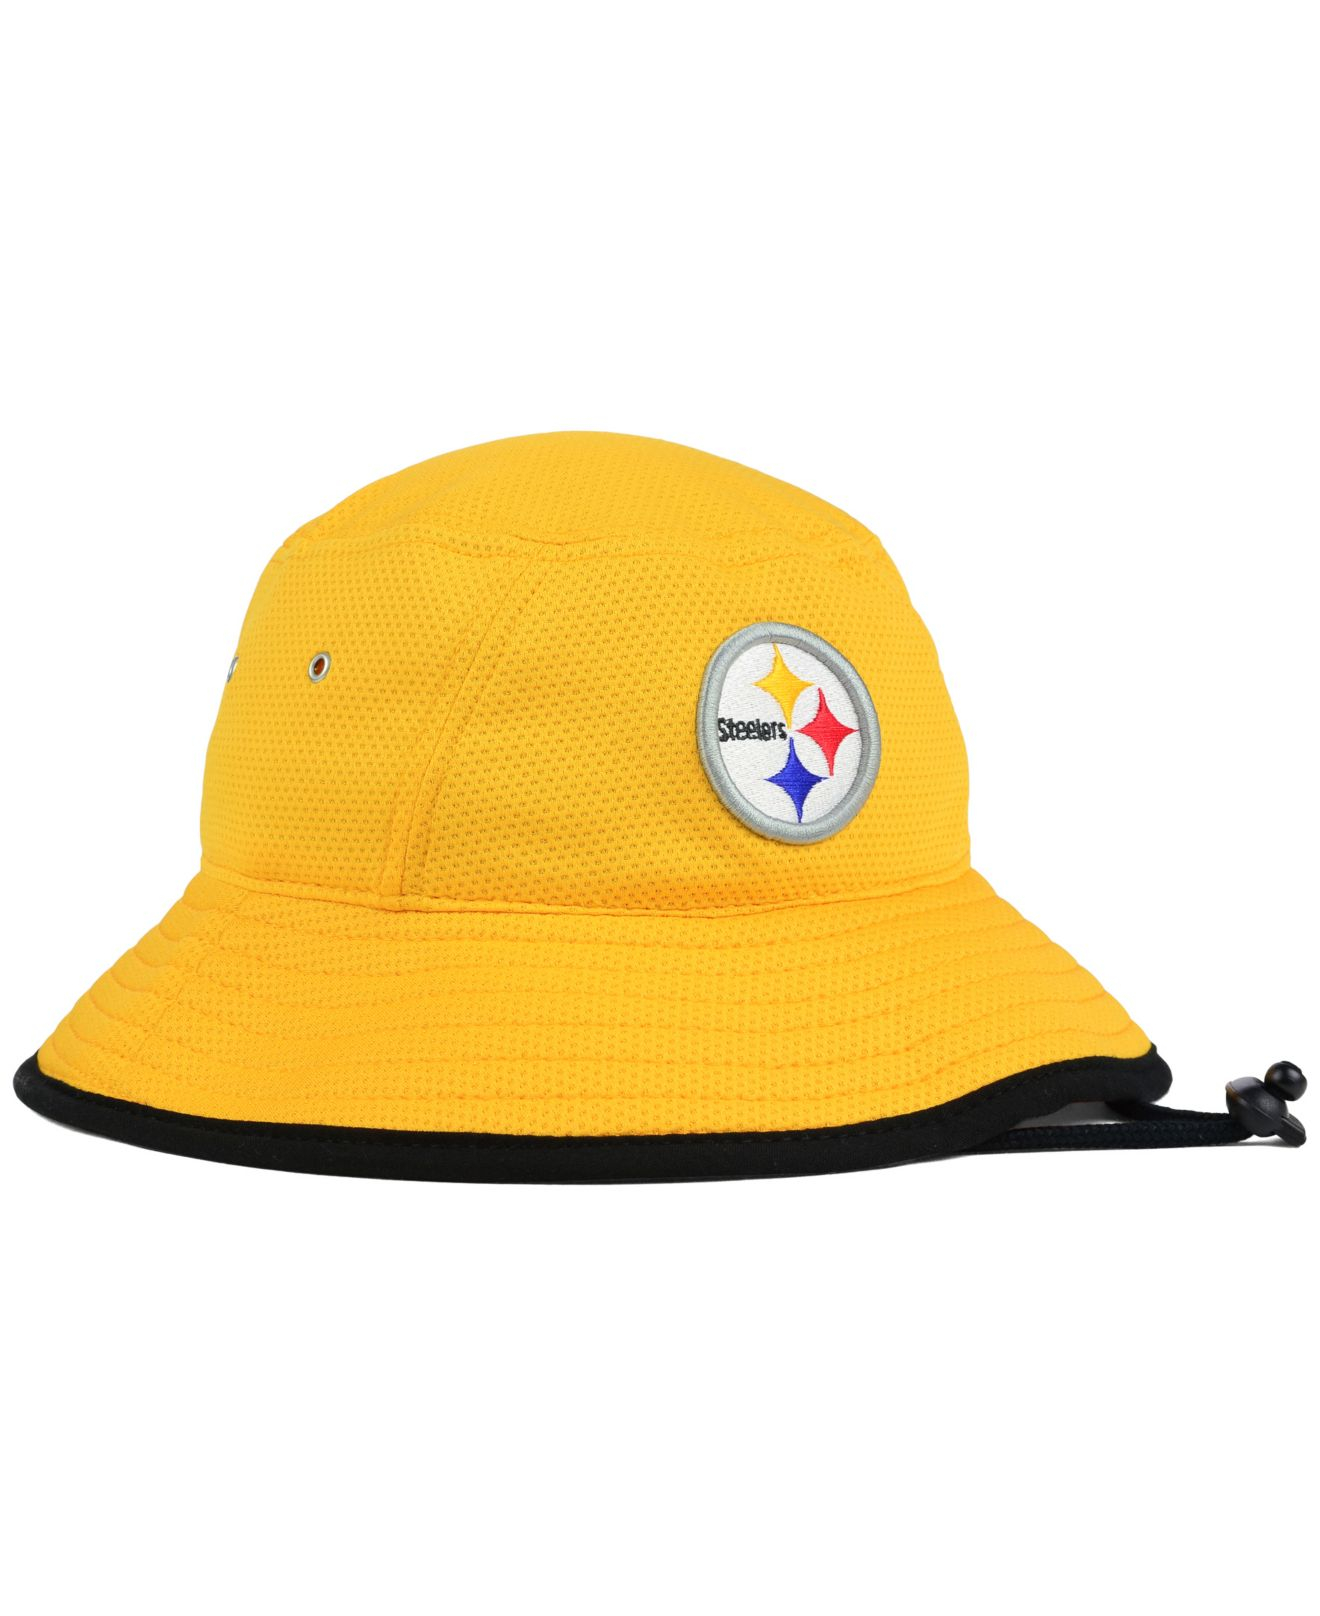 Lyst - KTZ Pittsburgh Steelers Training Bucket Hat in Yellow for Men 71873bdf6